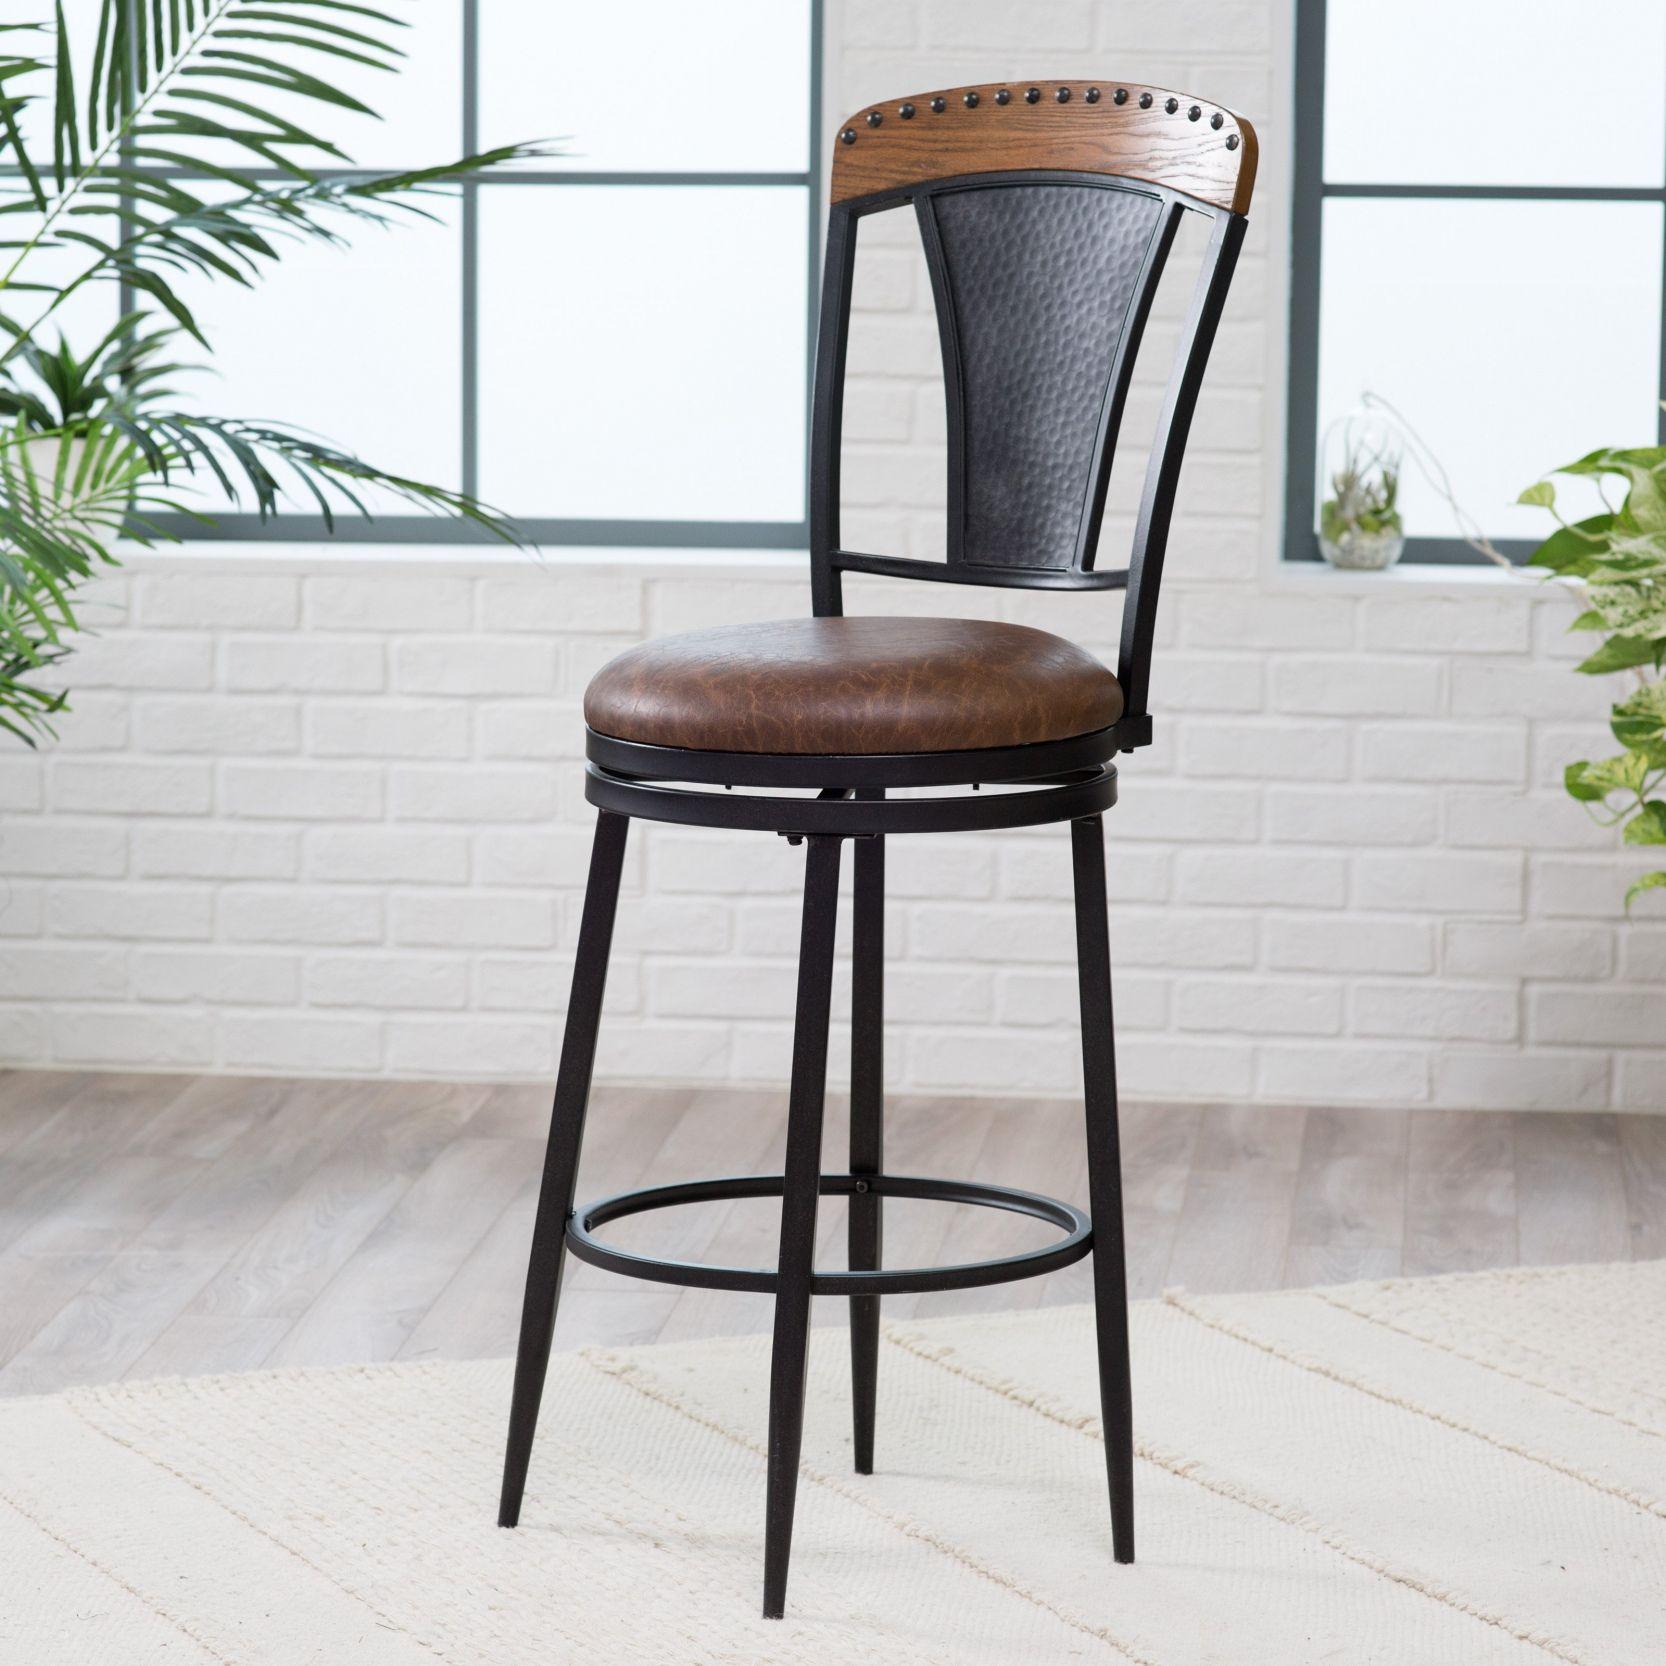 70 bar stool extenders diy modern furniture check more at http evildaysoflucklessjohn com 20 bar stool extenders elite modern furniture